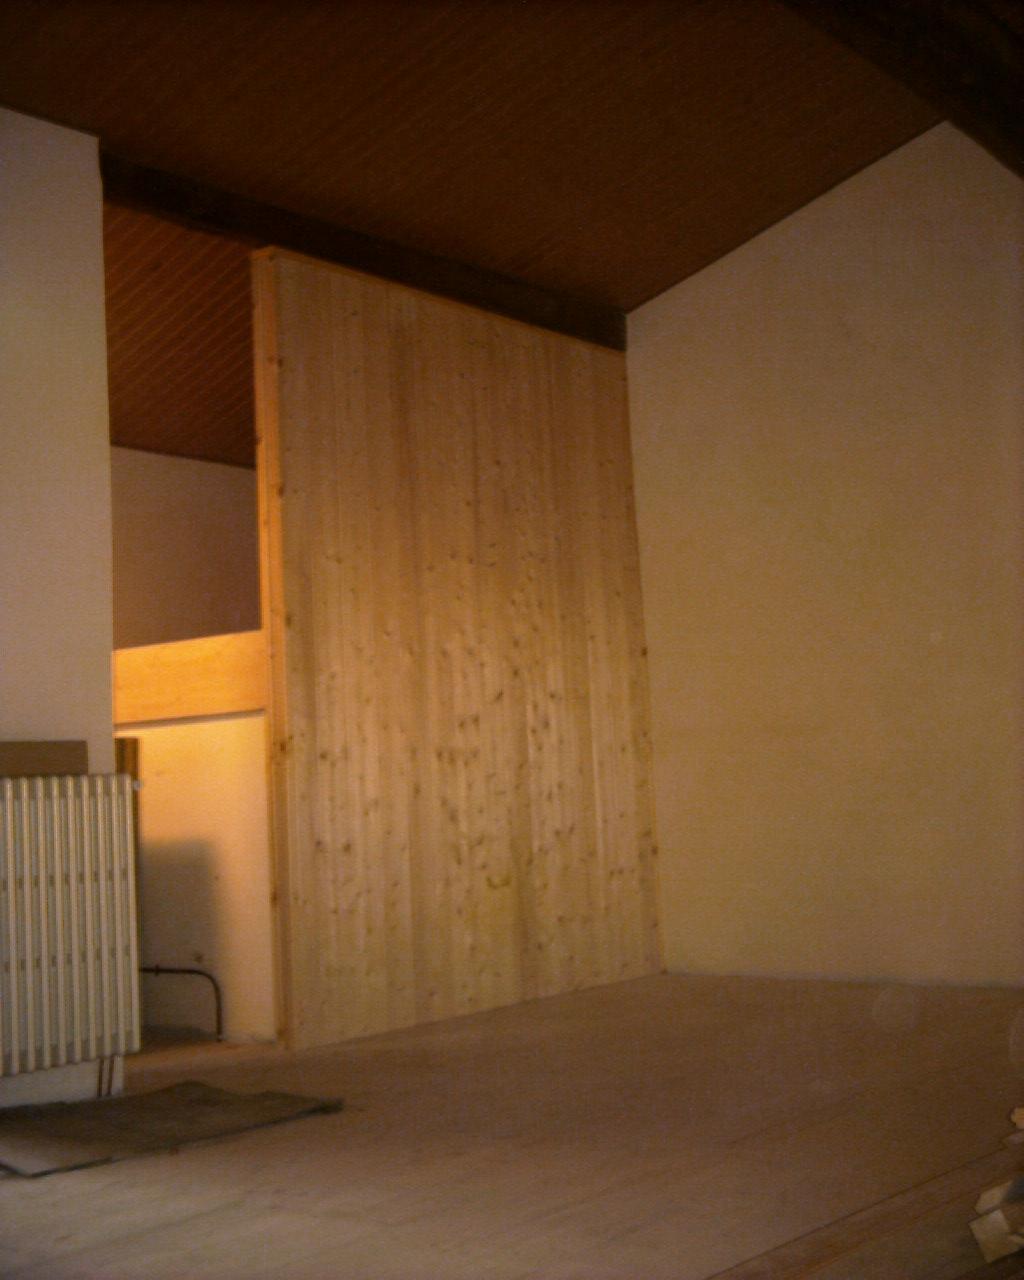 Rivestimento interno parete - Rivestimento parete interna ...